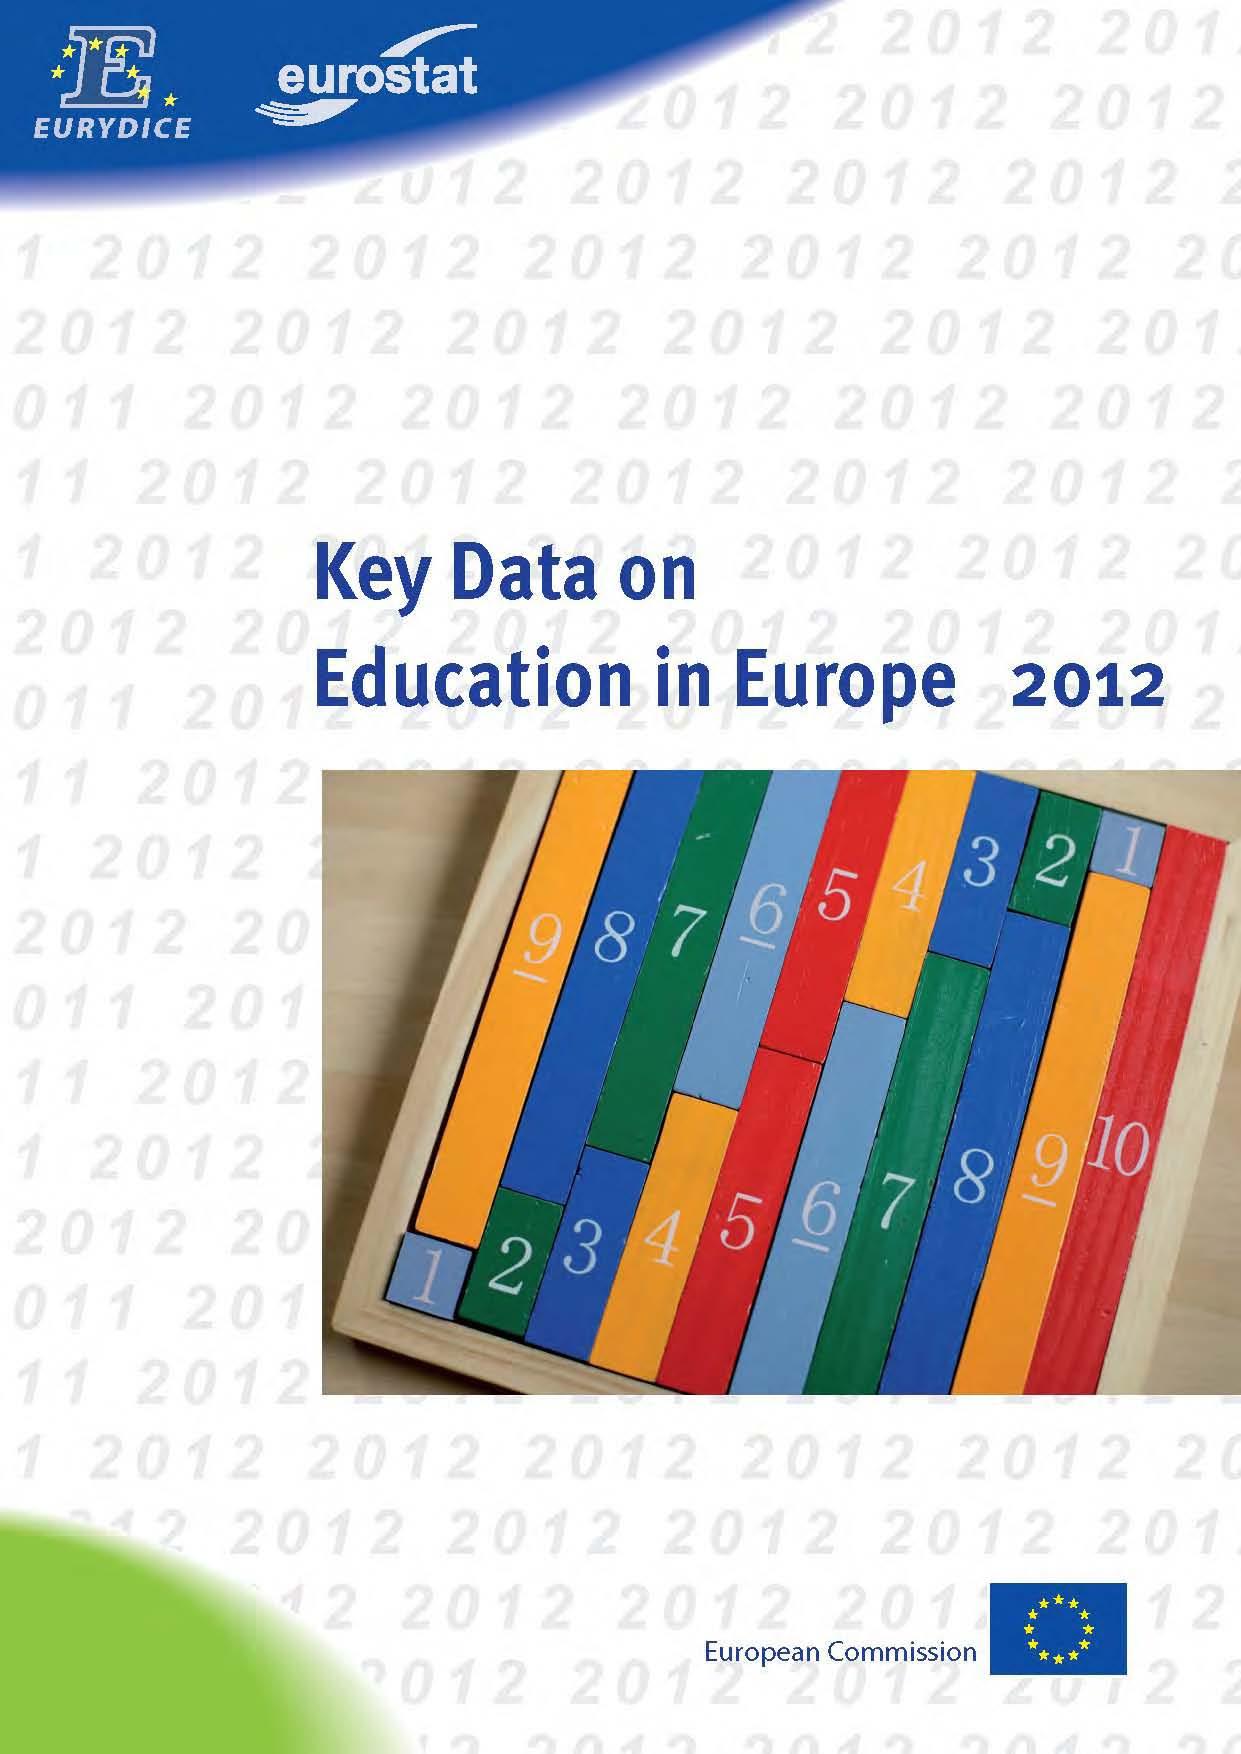 Key data on education in Europe 2012